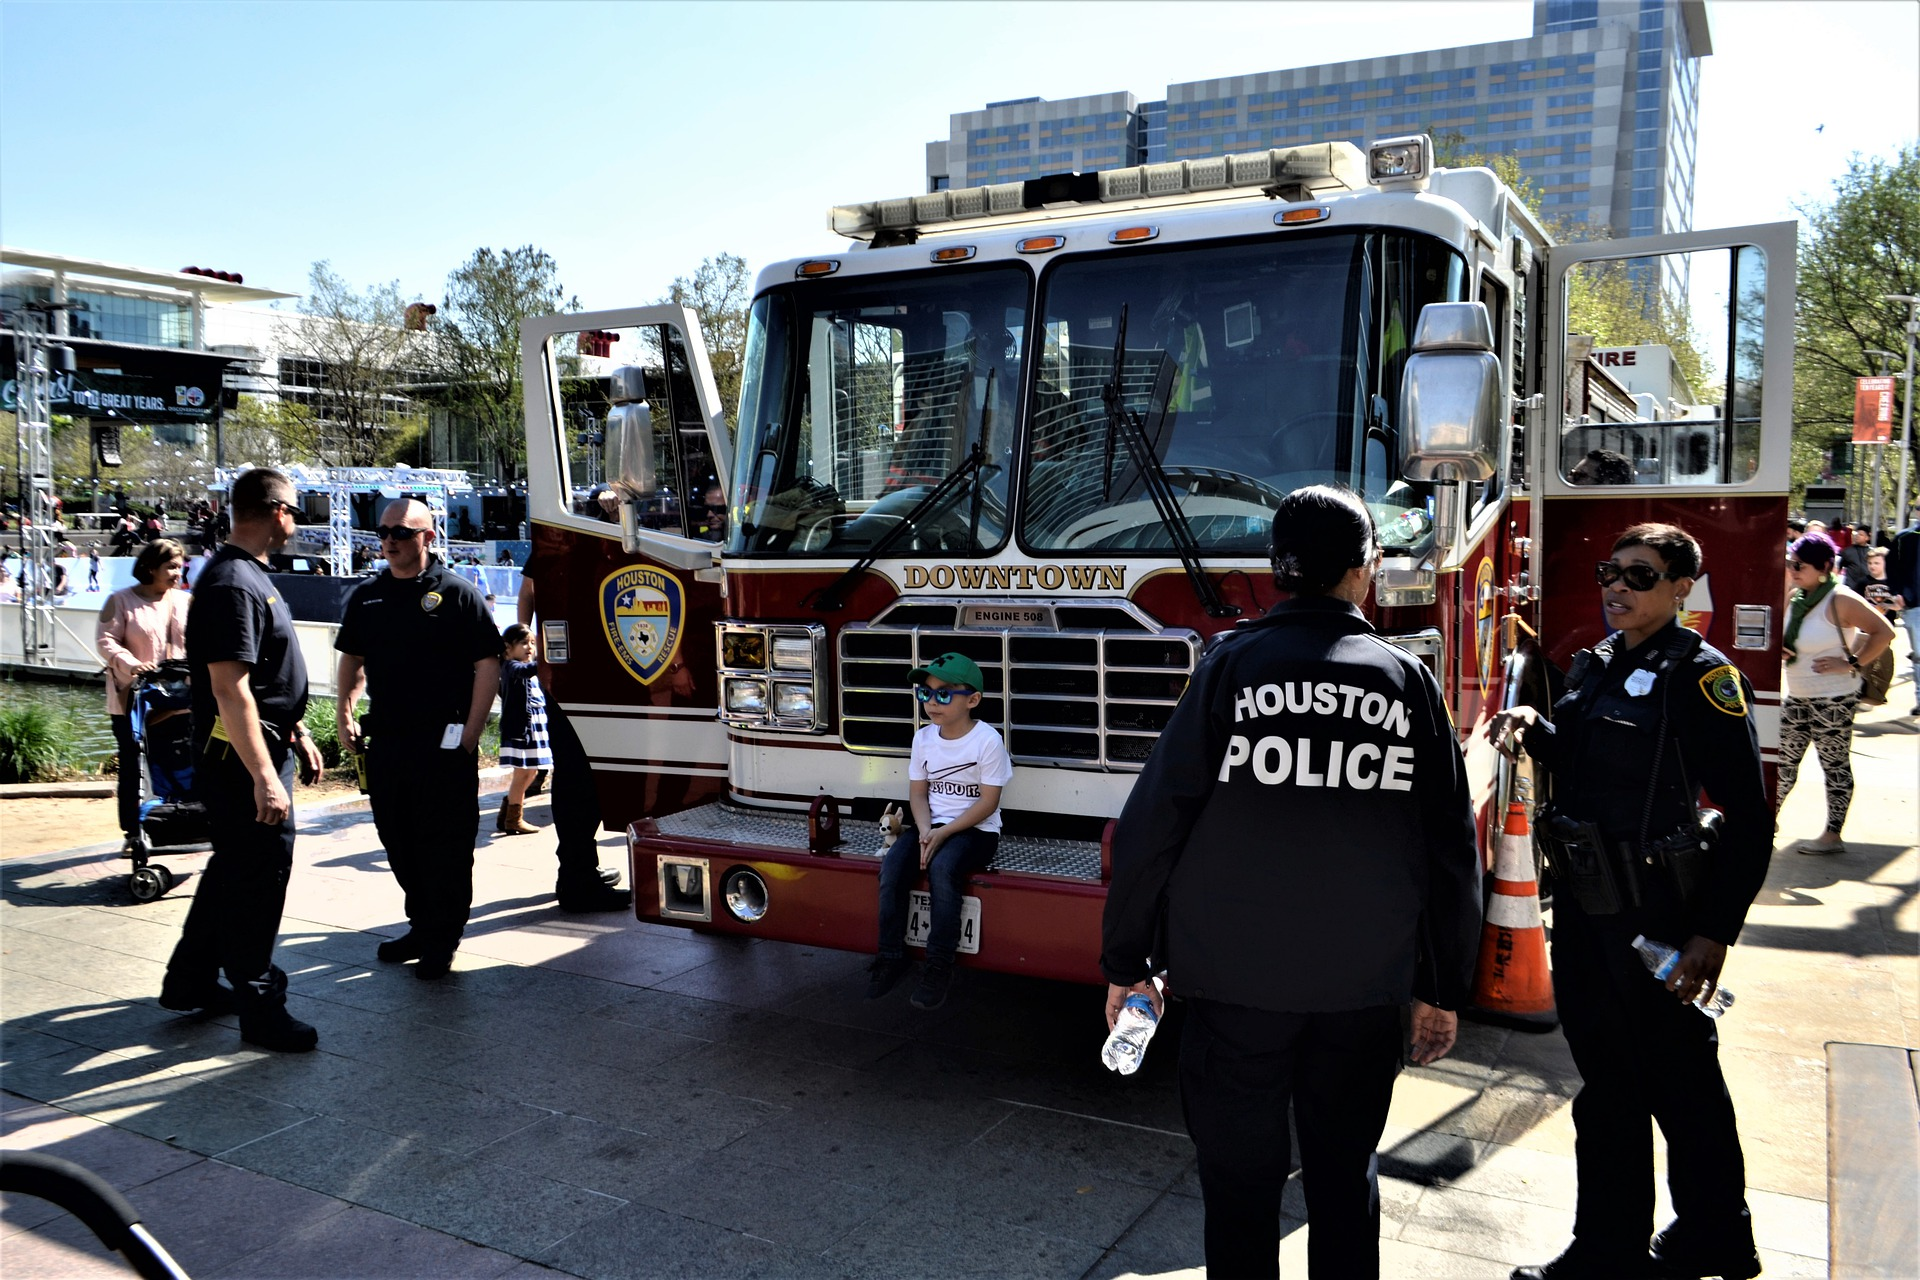 First Responders (Firefighter, Police, Emergency Medical Technician (EMT))